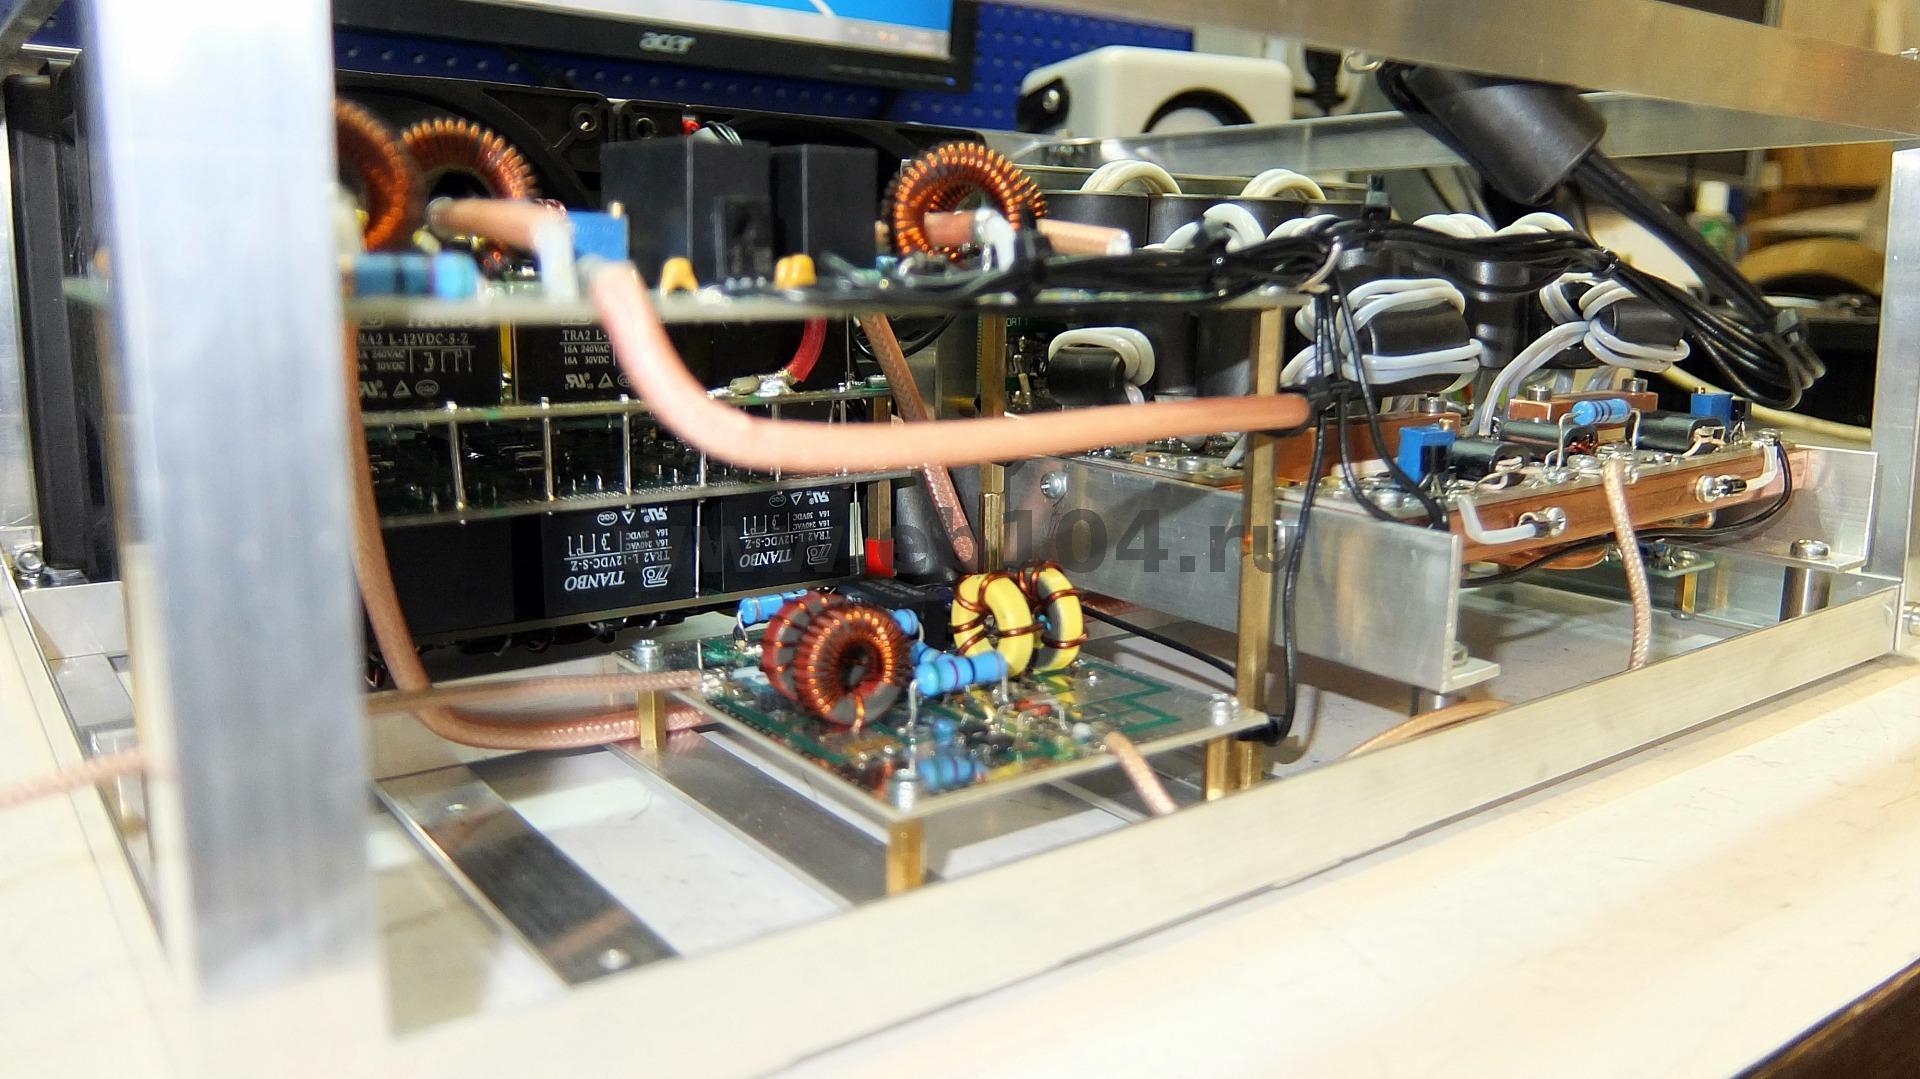 Dual 3000W Pep Ldmos Rf Amplifier - Swdigital